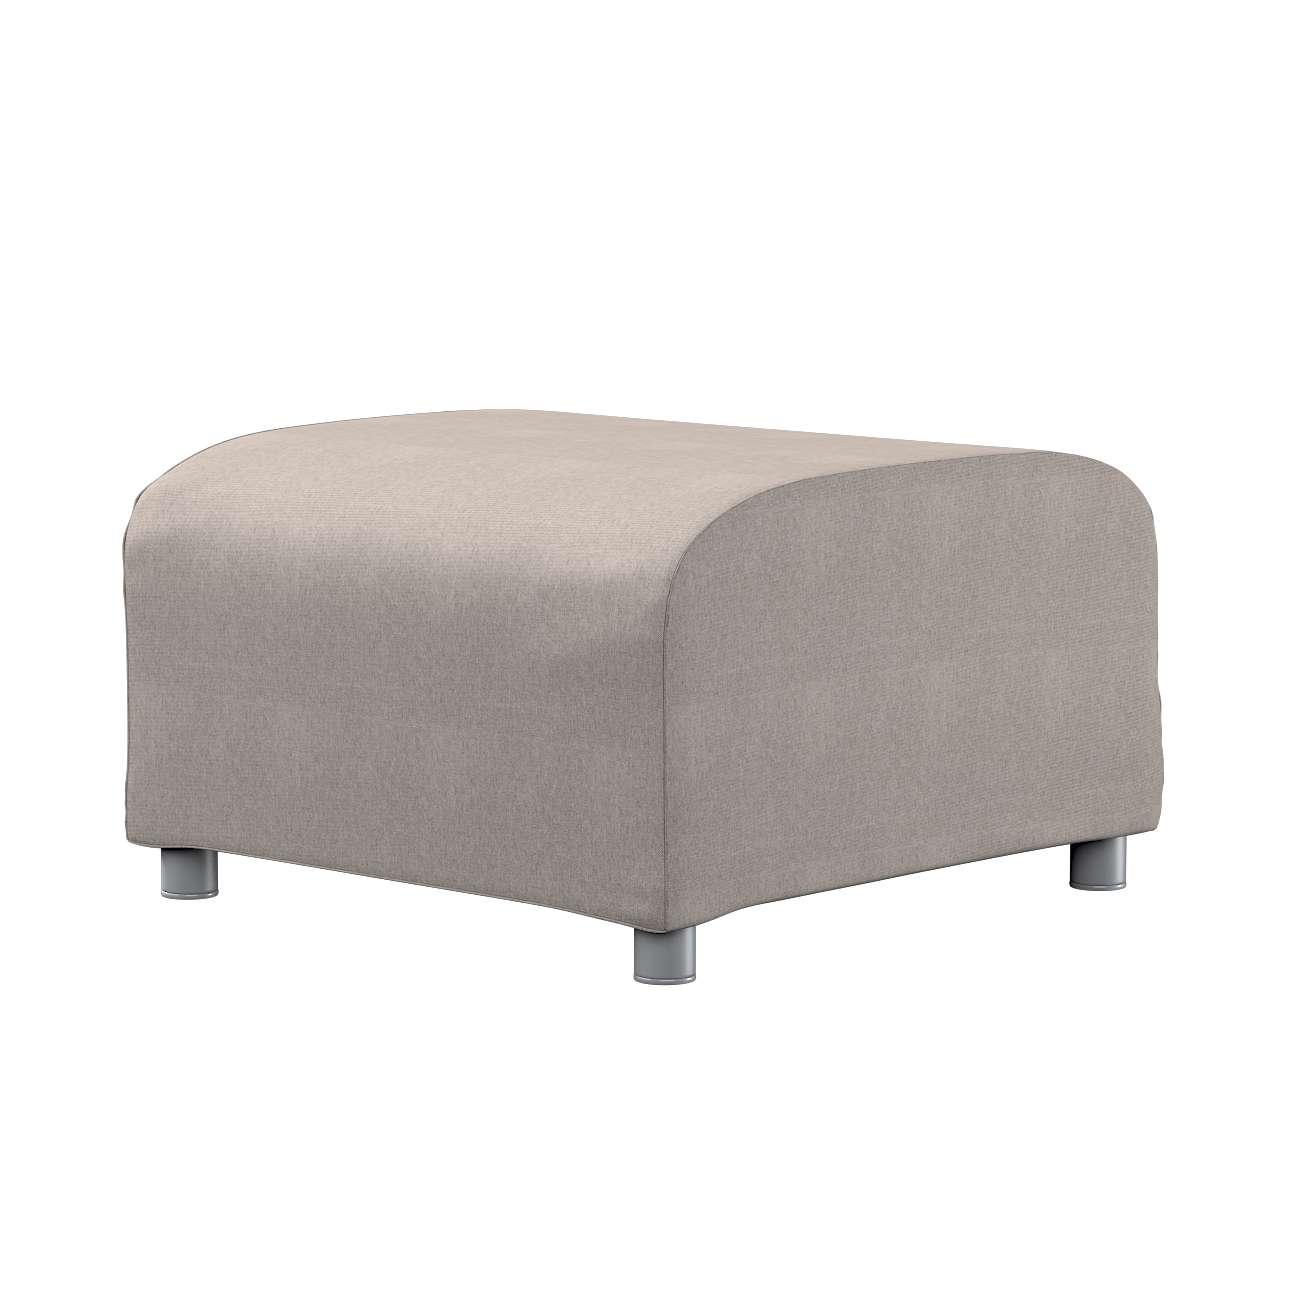 klippan hockerbezug beige grau dekoria. Black Bedroom Furniture Sets. Home Design Ideas